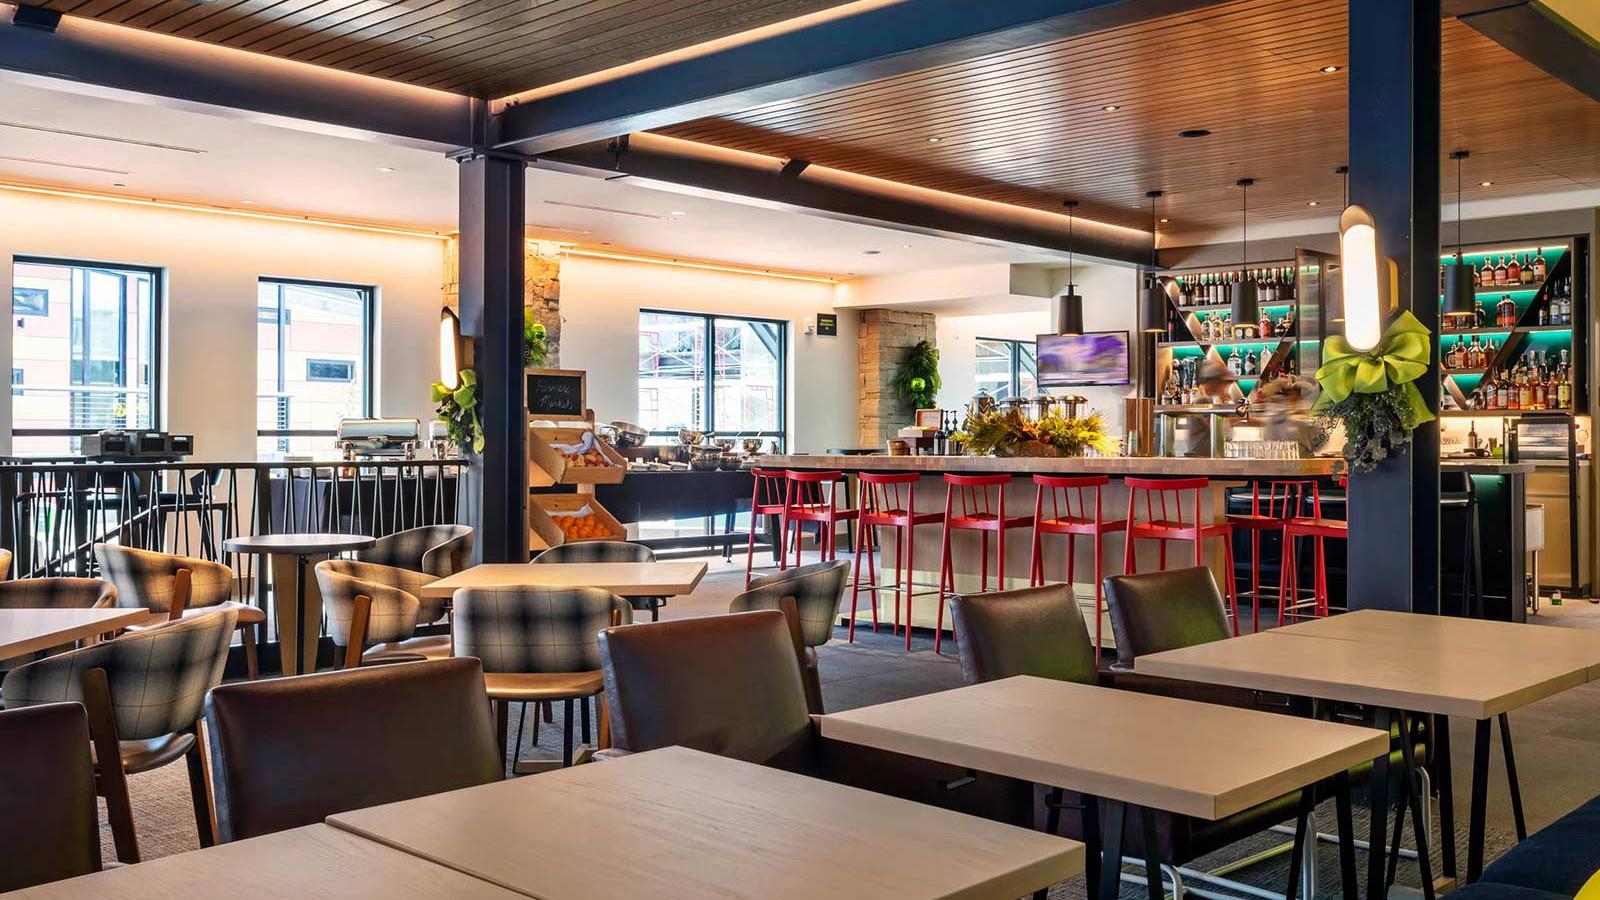 Limelight Snowmass Hotel, Aspen - Breakfast Area and Bar